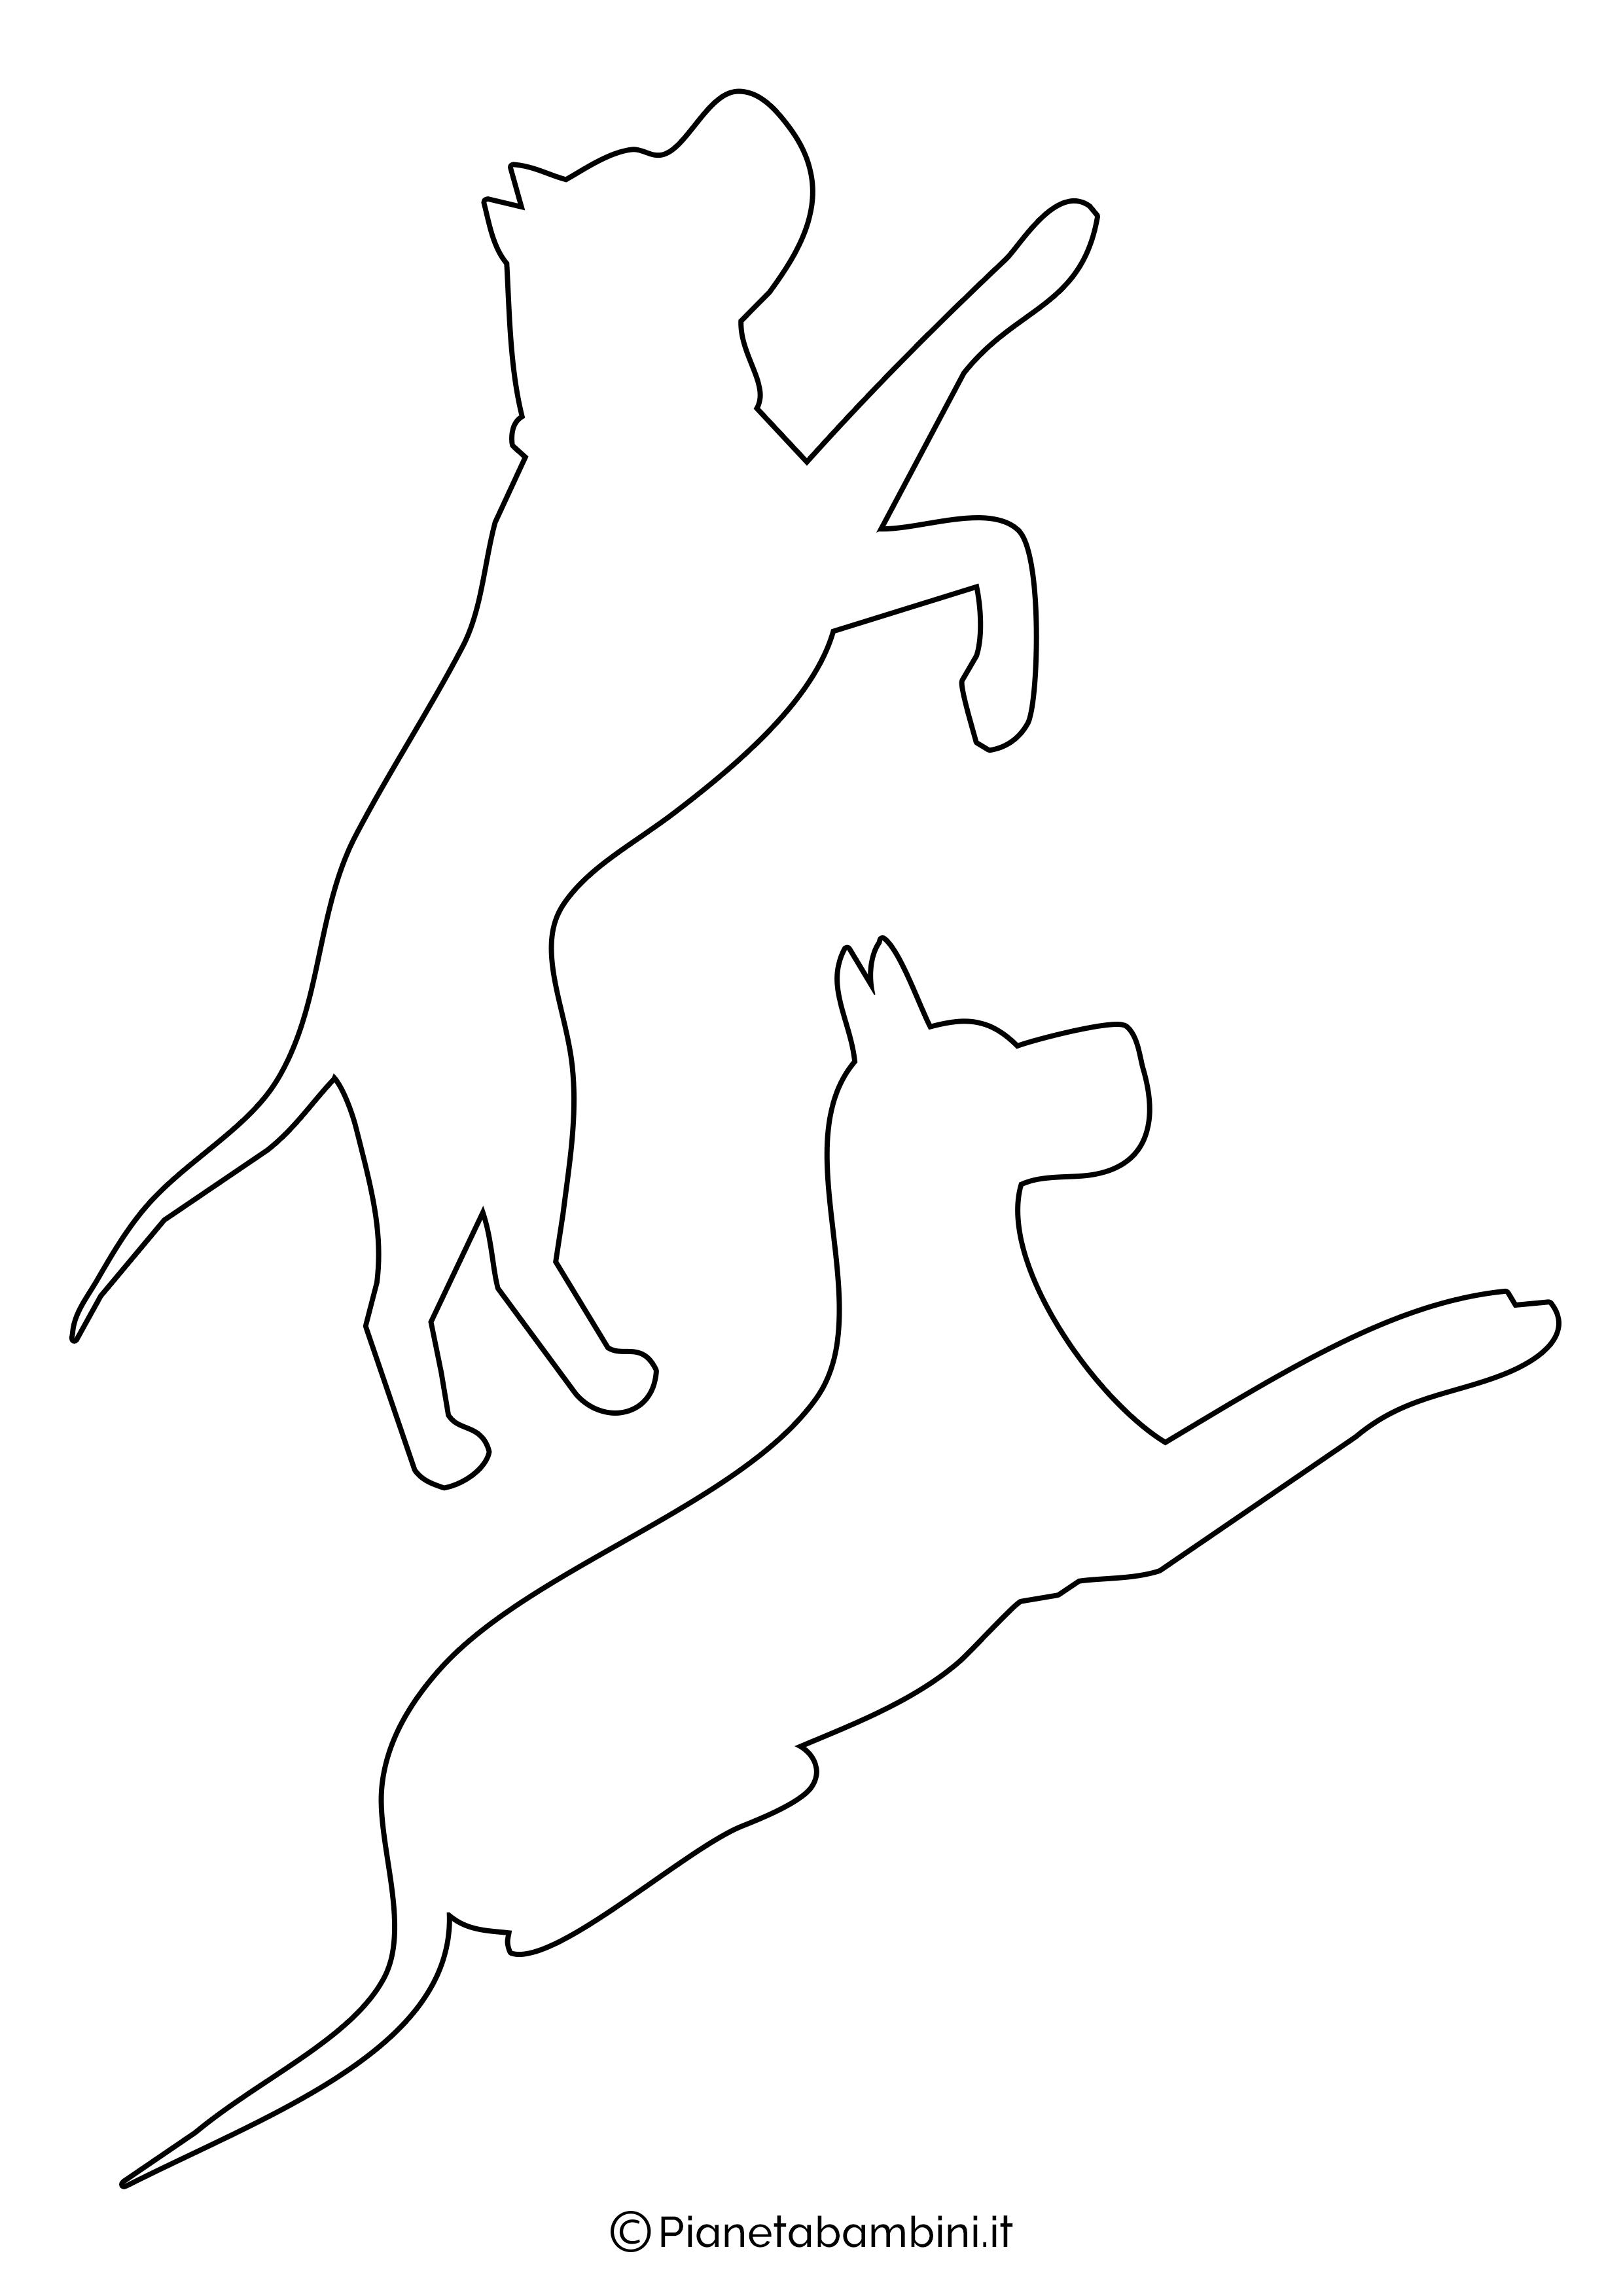 Sagome di cani medie da ritagliare 5